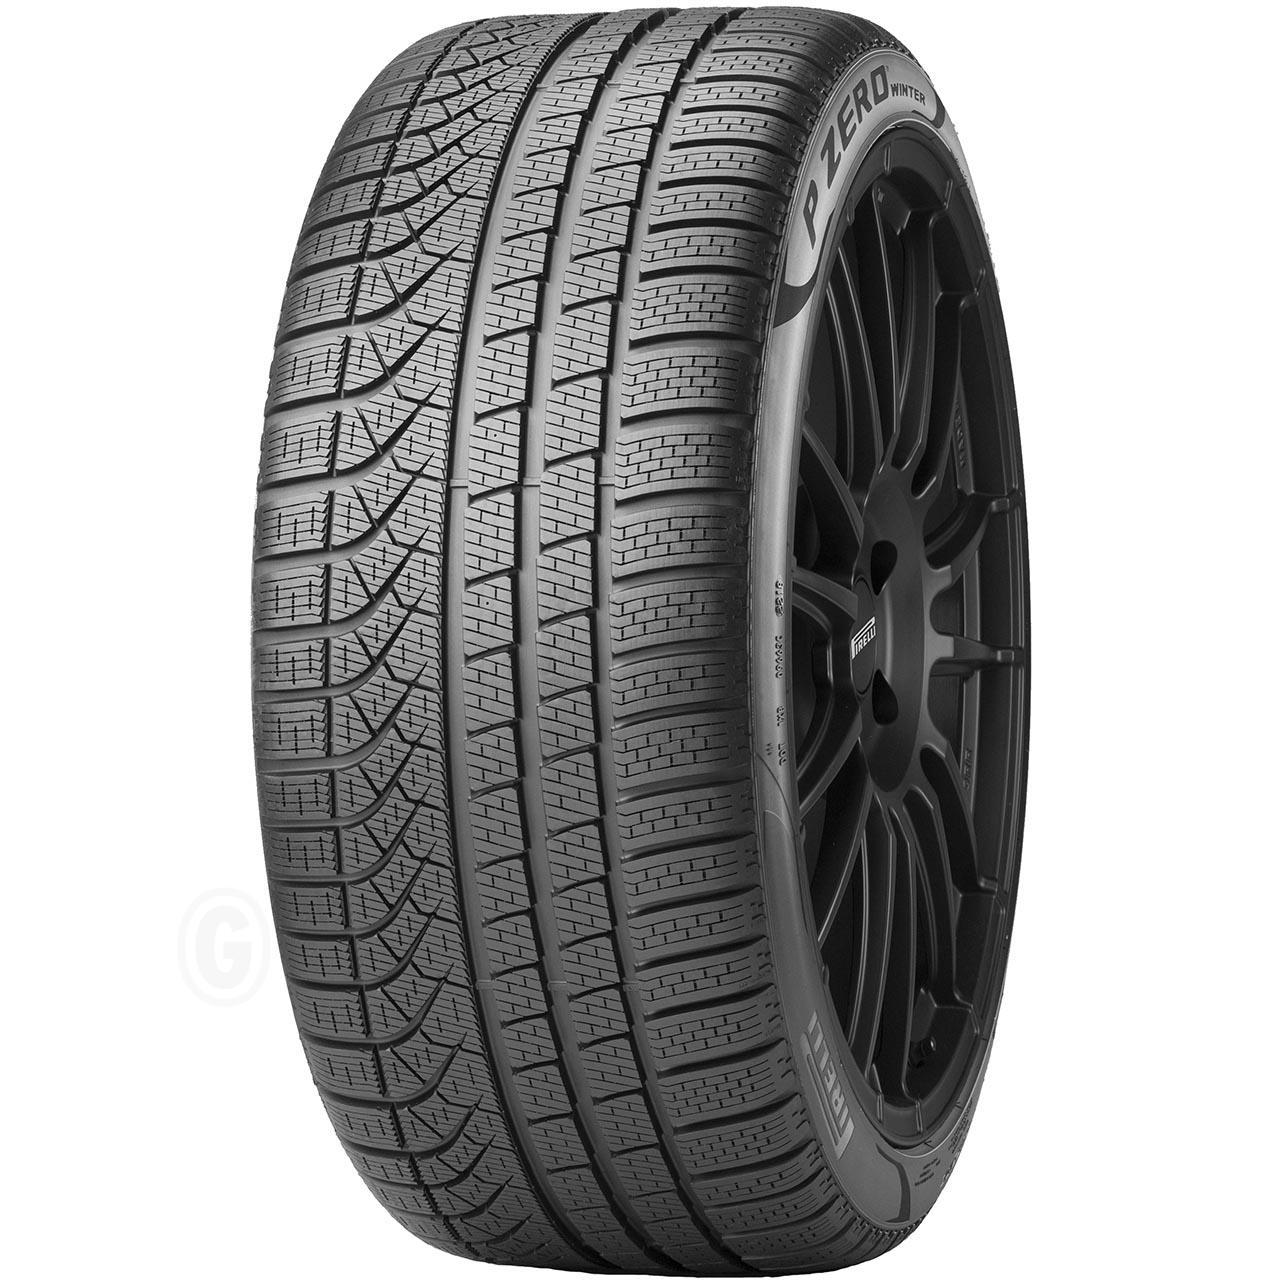 Pirelli Winter Pzero 305/30R21 100V